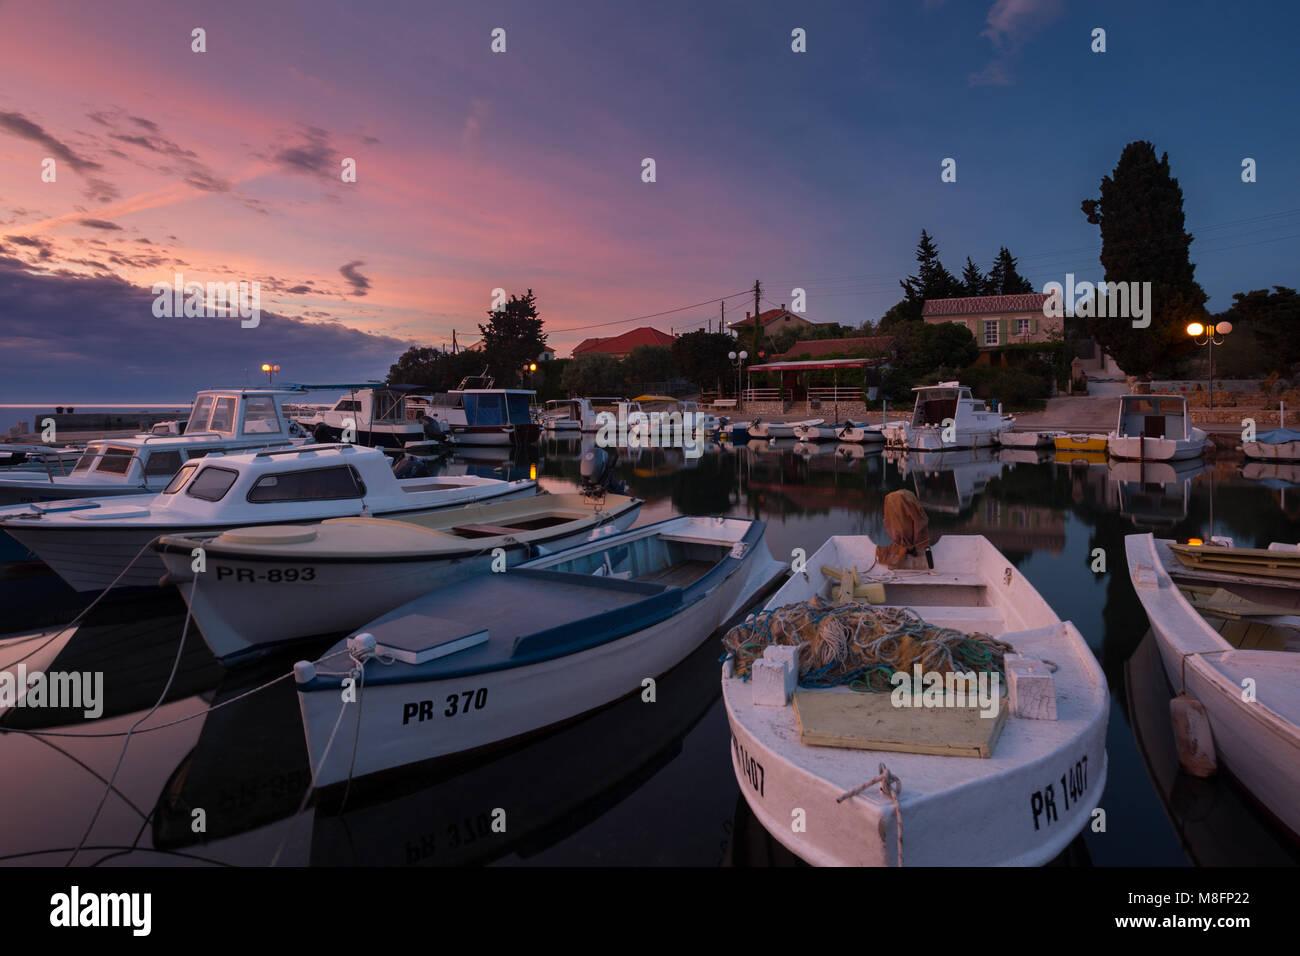 Kleine Bucht in Ceprljanda Ort Ugljan auf der Insel Dugi Otok, Dalmatien, Kroatien Stockbild